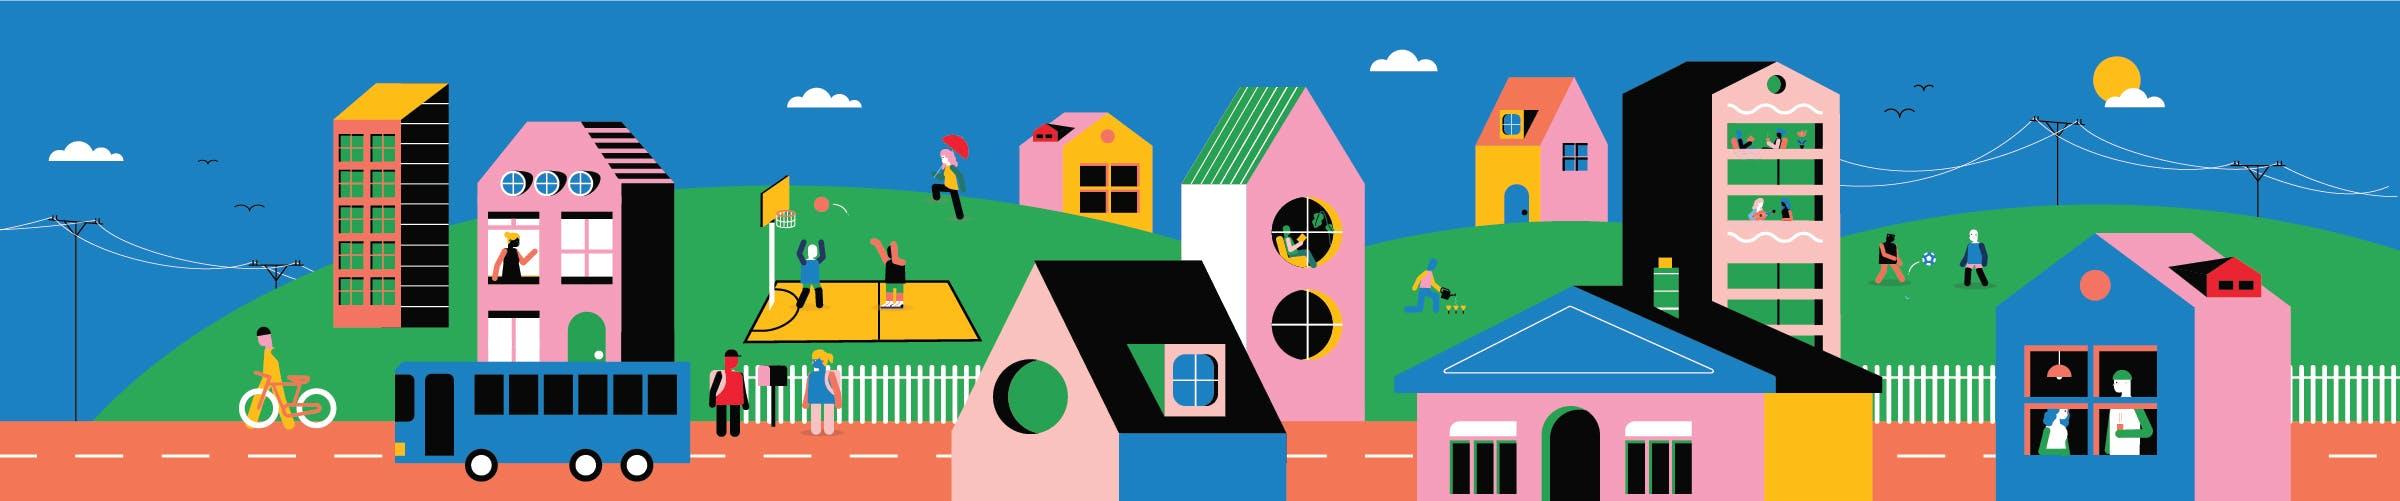 City Housing rent-setting